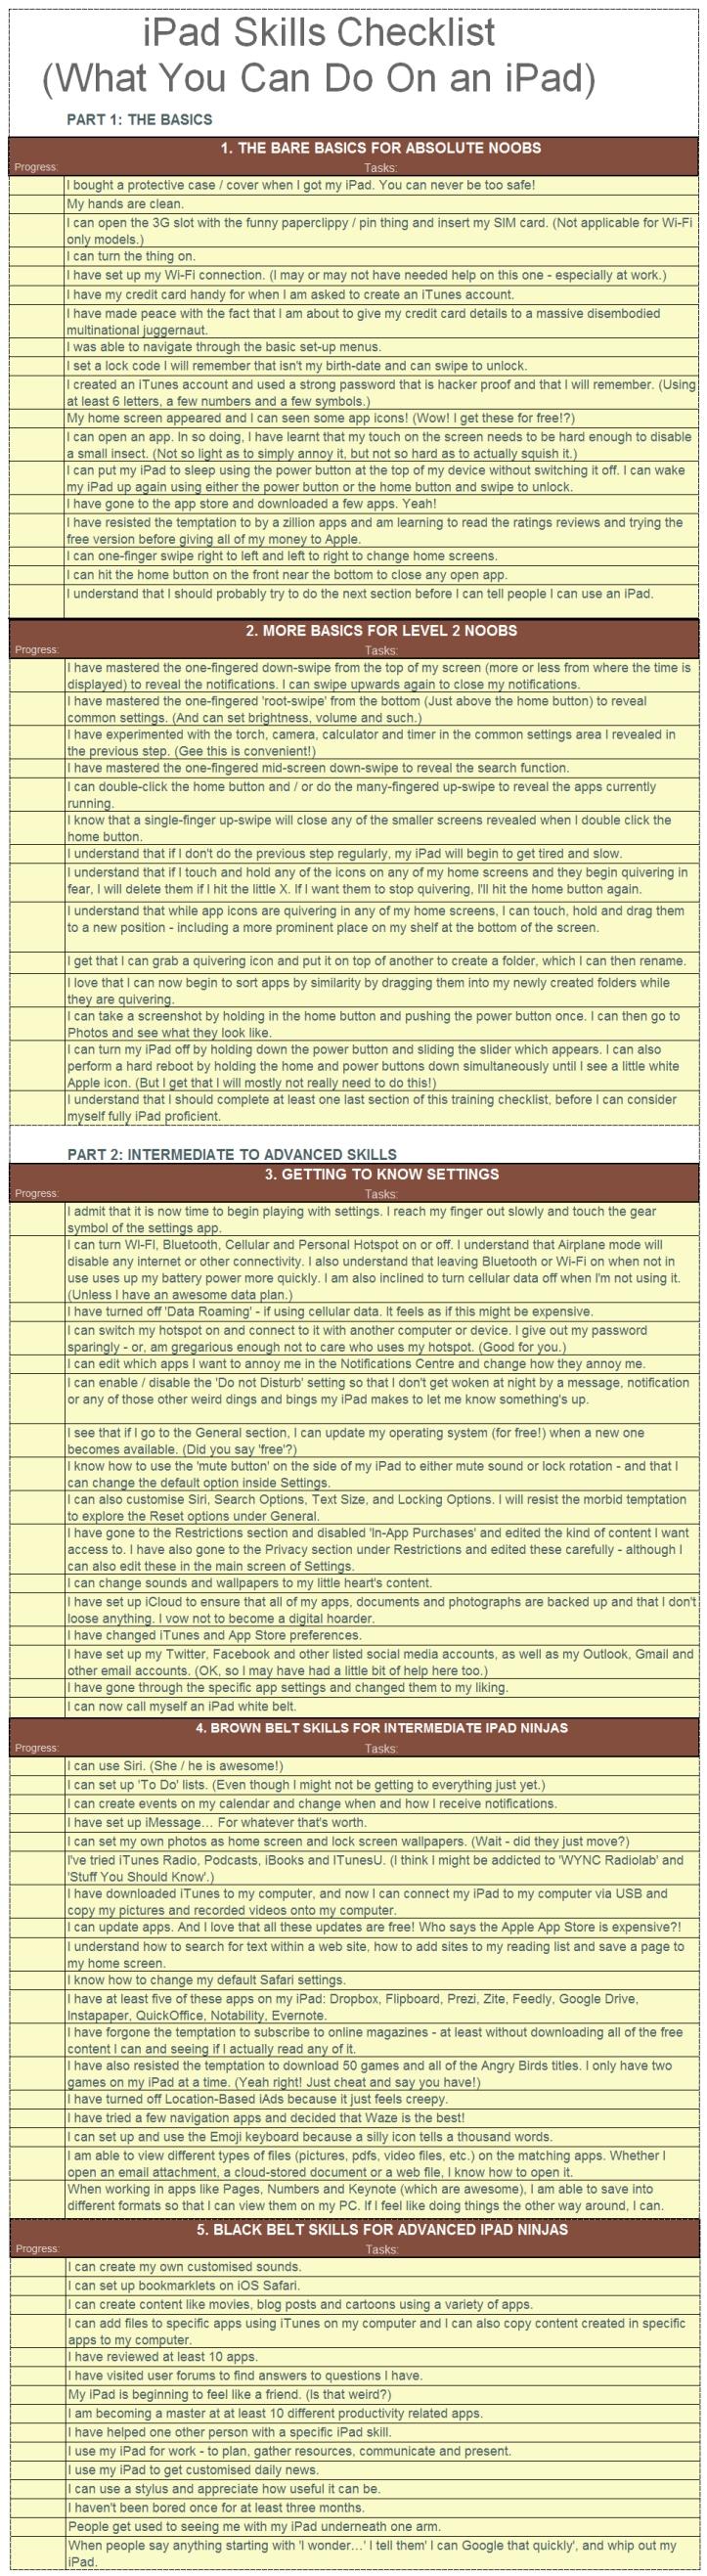 iPad Checklist